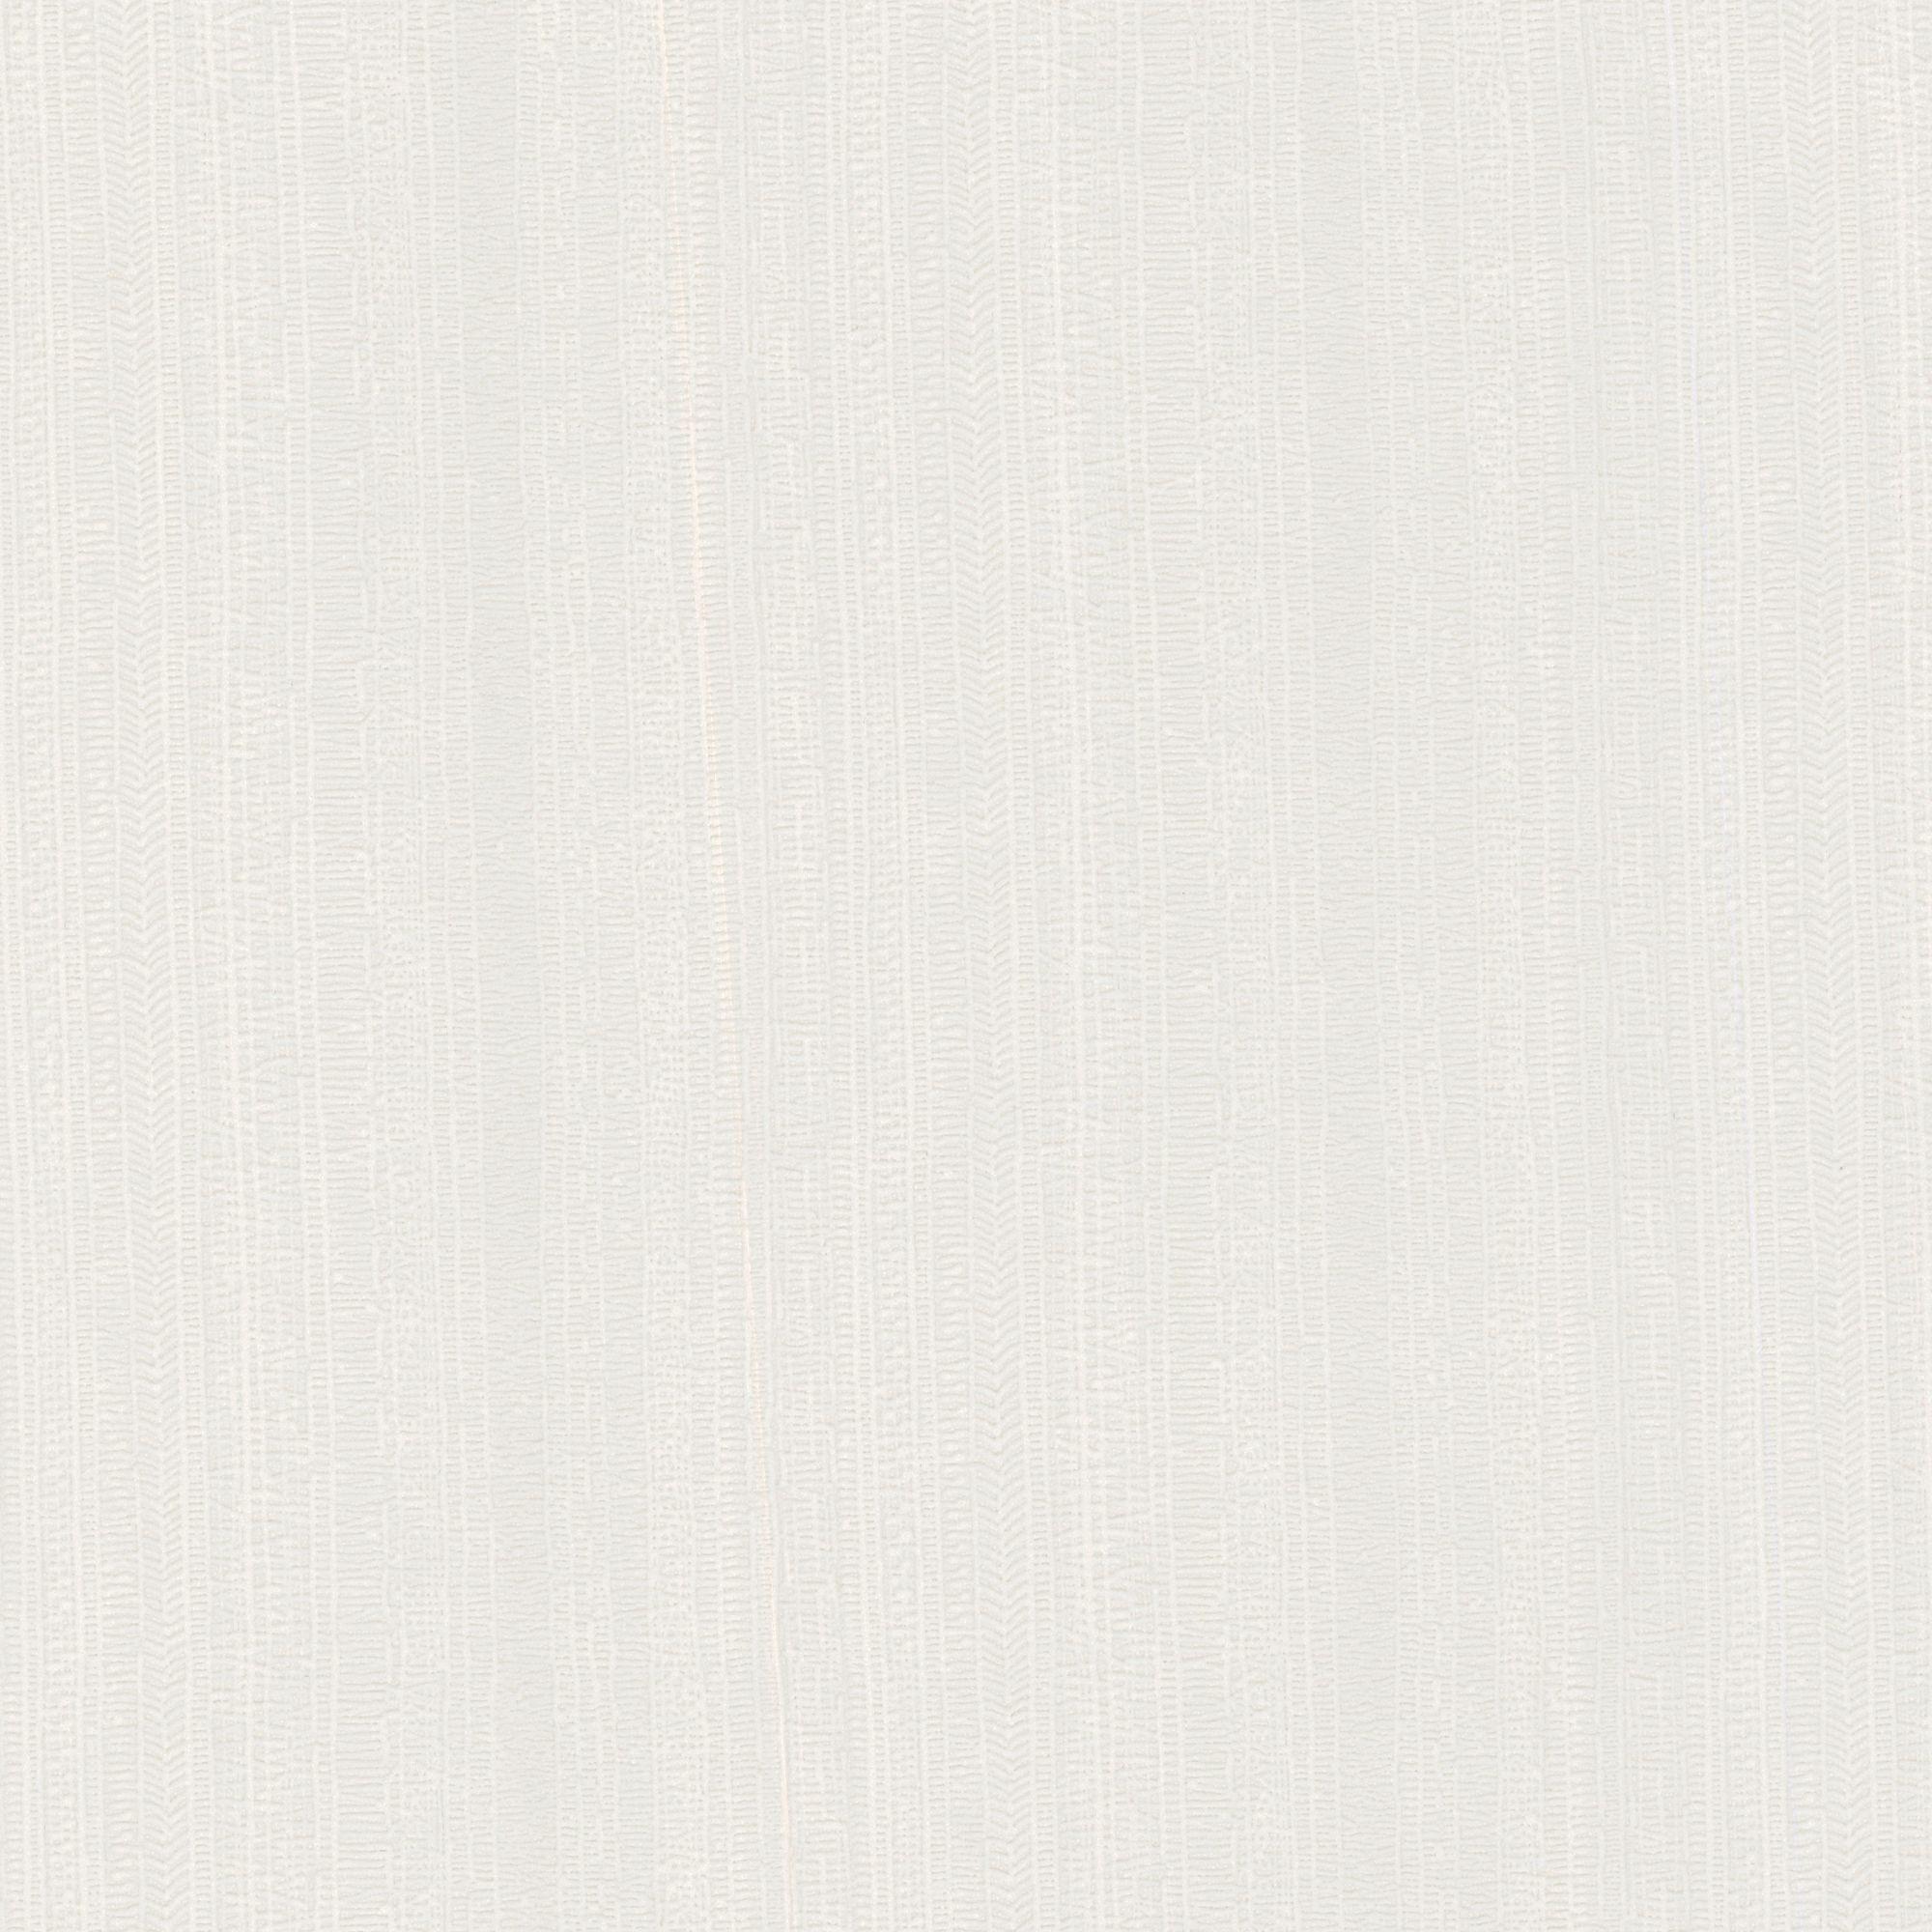 Graham & Brown Superfresco White Patterned Stripe Paintable Wallpaper